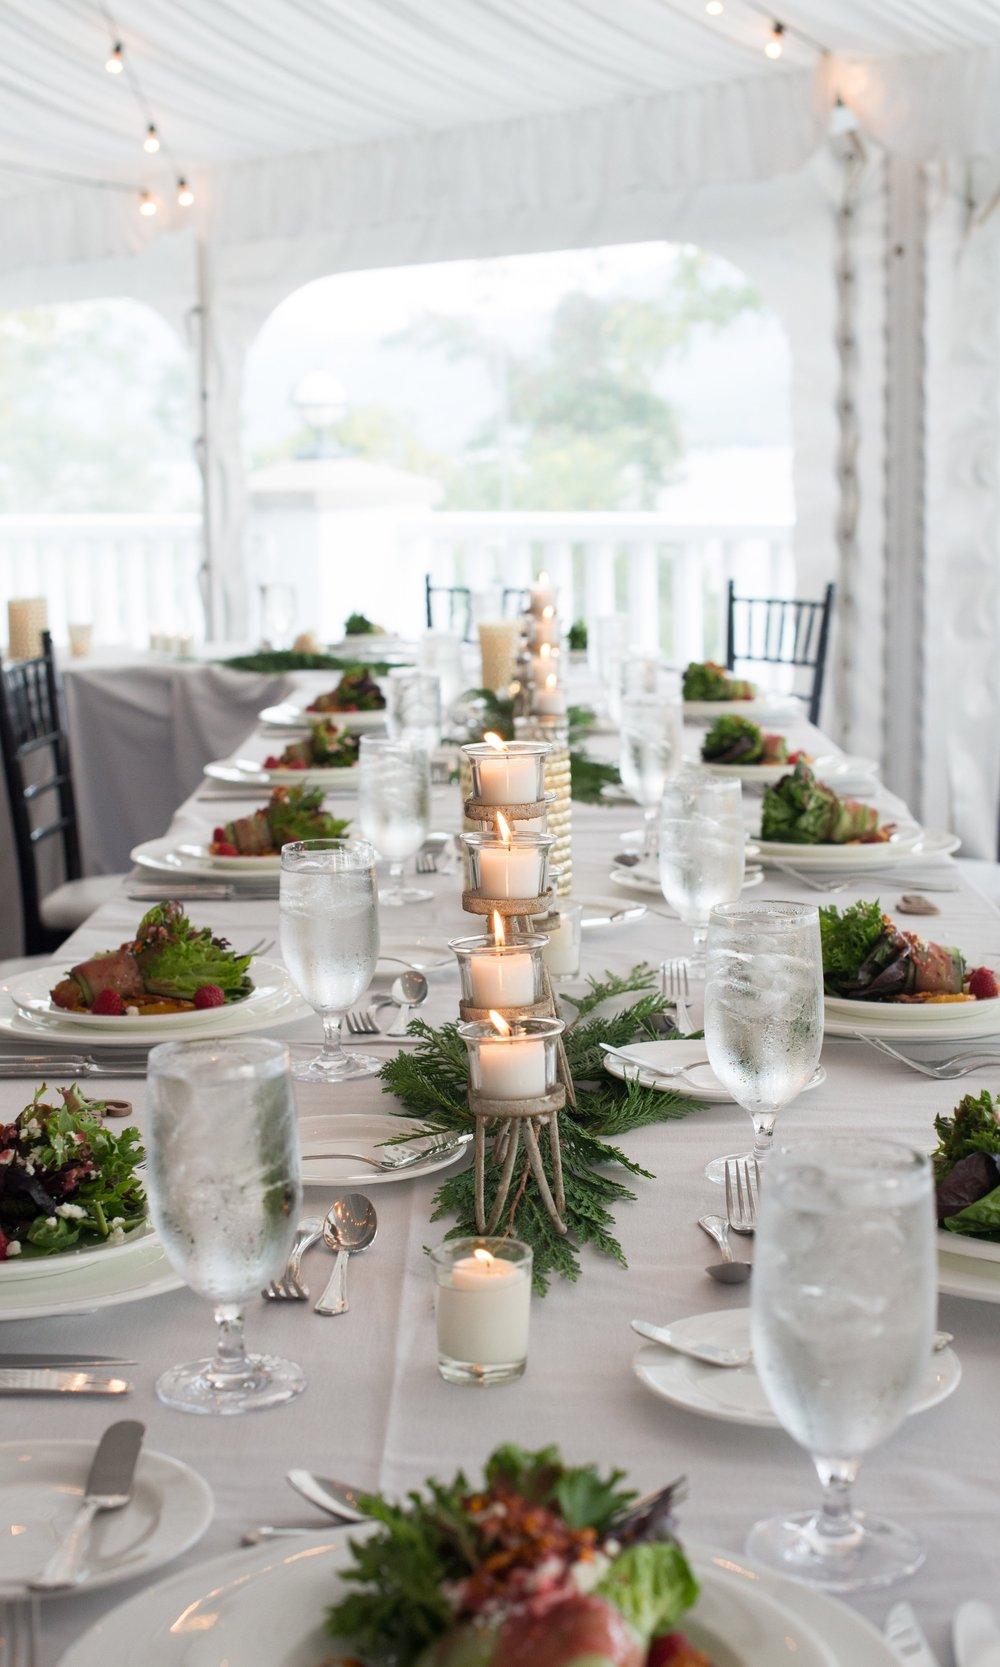 head-table-setting-reception-sagamore-resort-lake-george-ny-wedding-ym-photography